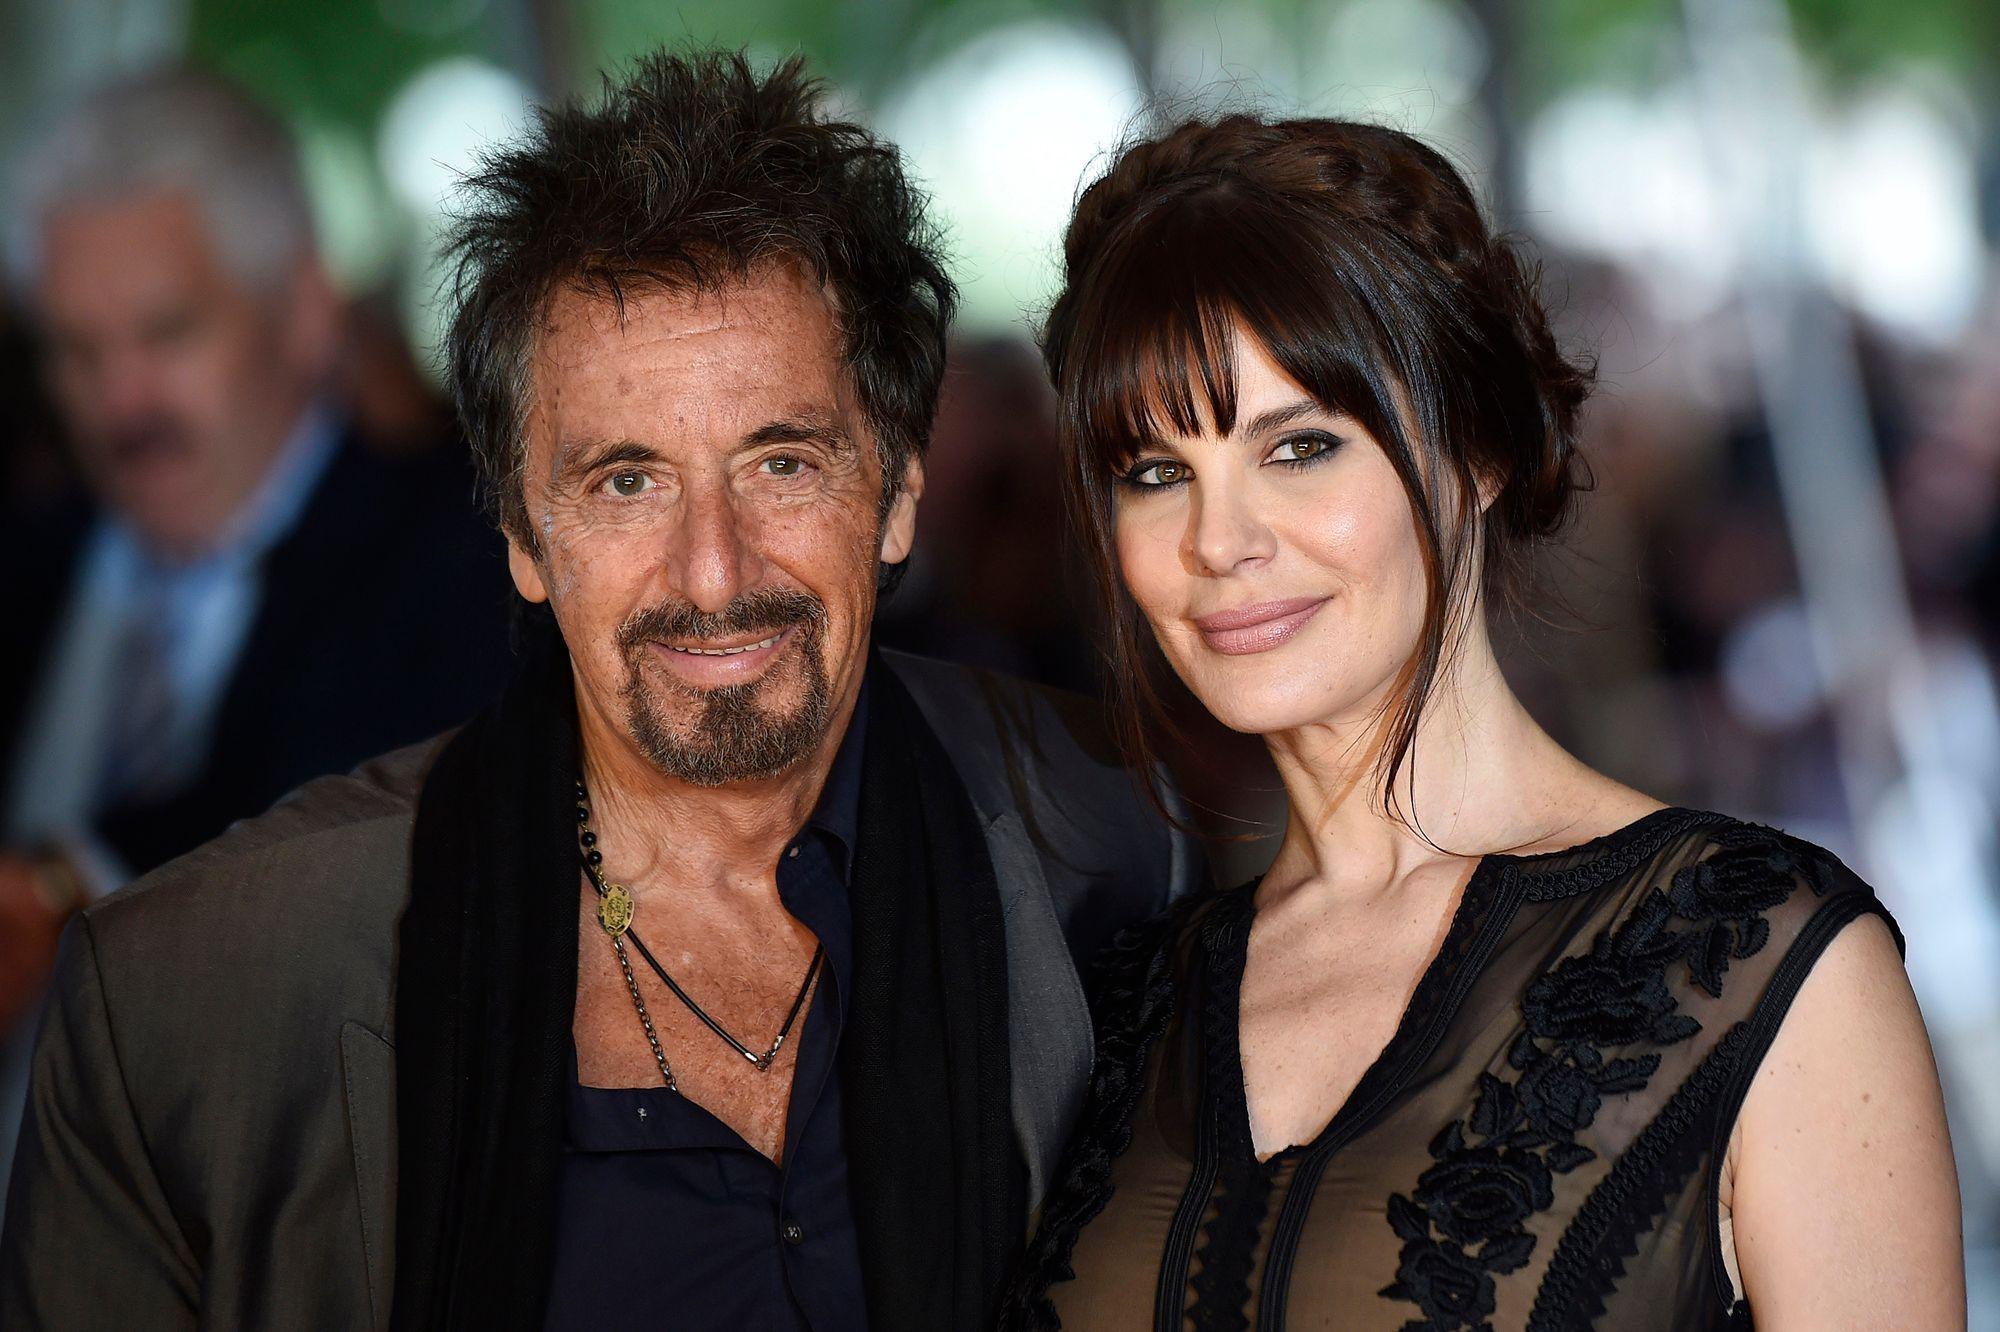 Femme De Habillées Moins Parfum En Offres Chères Al Film Pacino Yvf7gbI6y